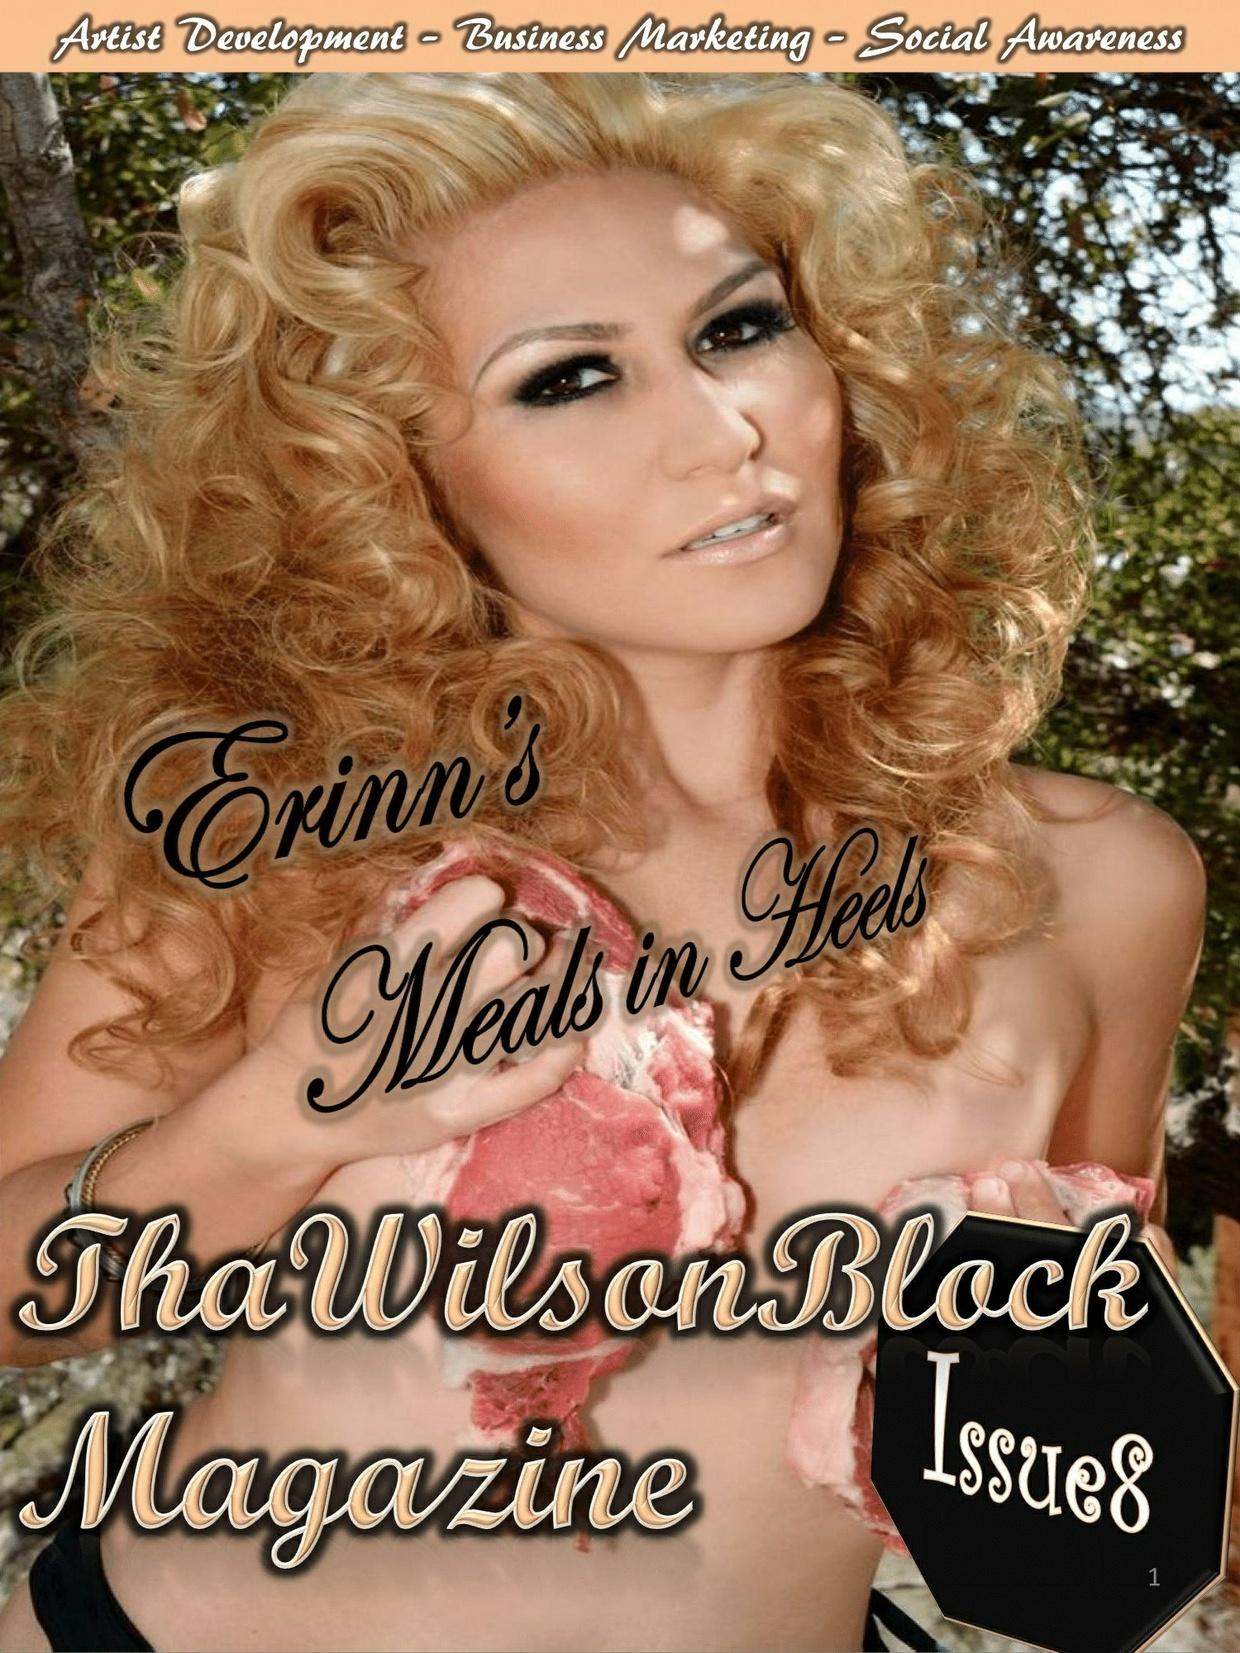 ThaWilsonBlock Magazine Issue8